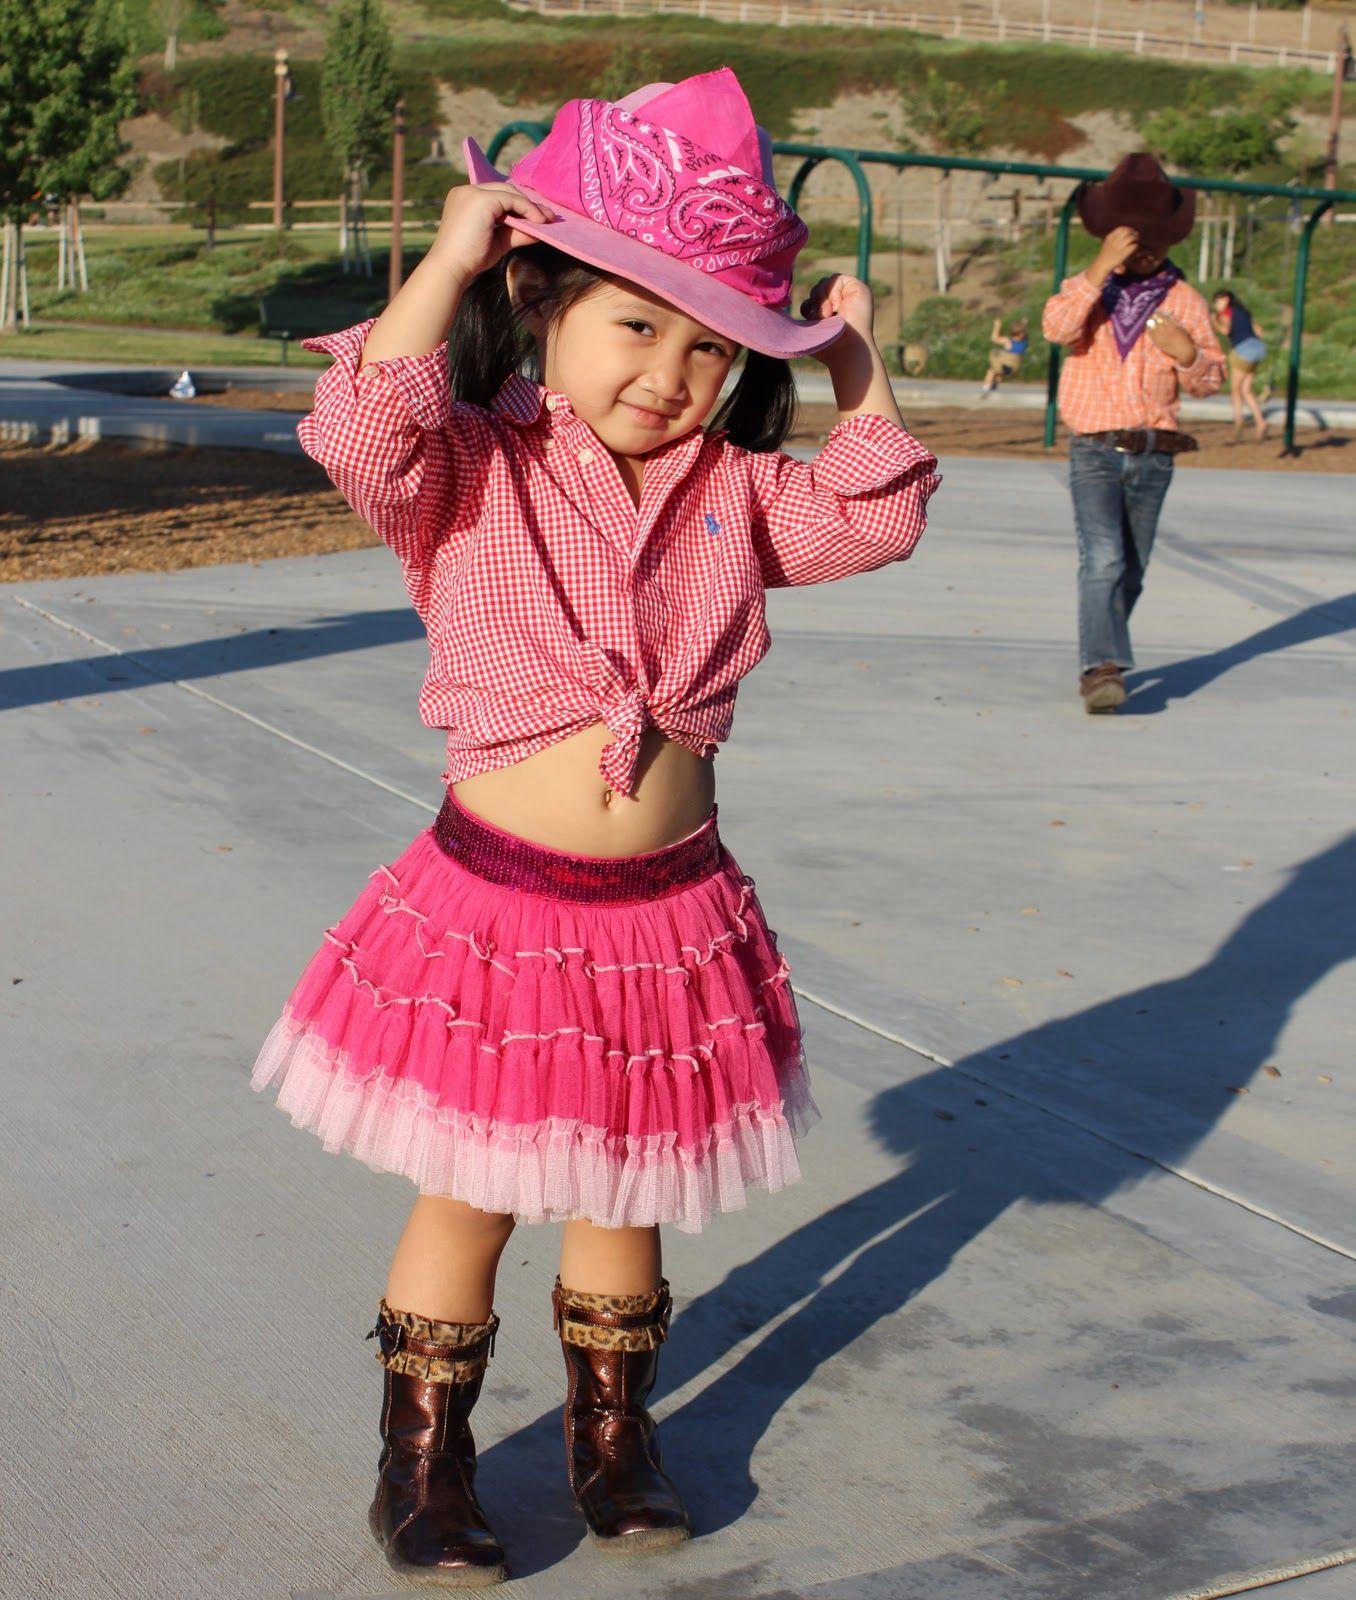 Homemade cowgirl costumes httpgreathalloweencostumes homemade cowgirl costumes httpgreathalloweencostumes solutioingenieria Choice Image